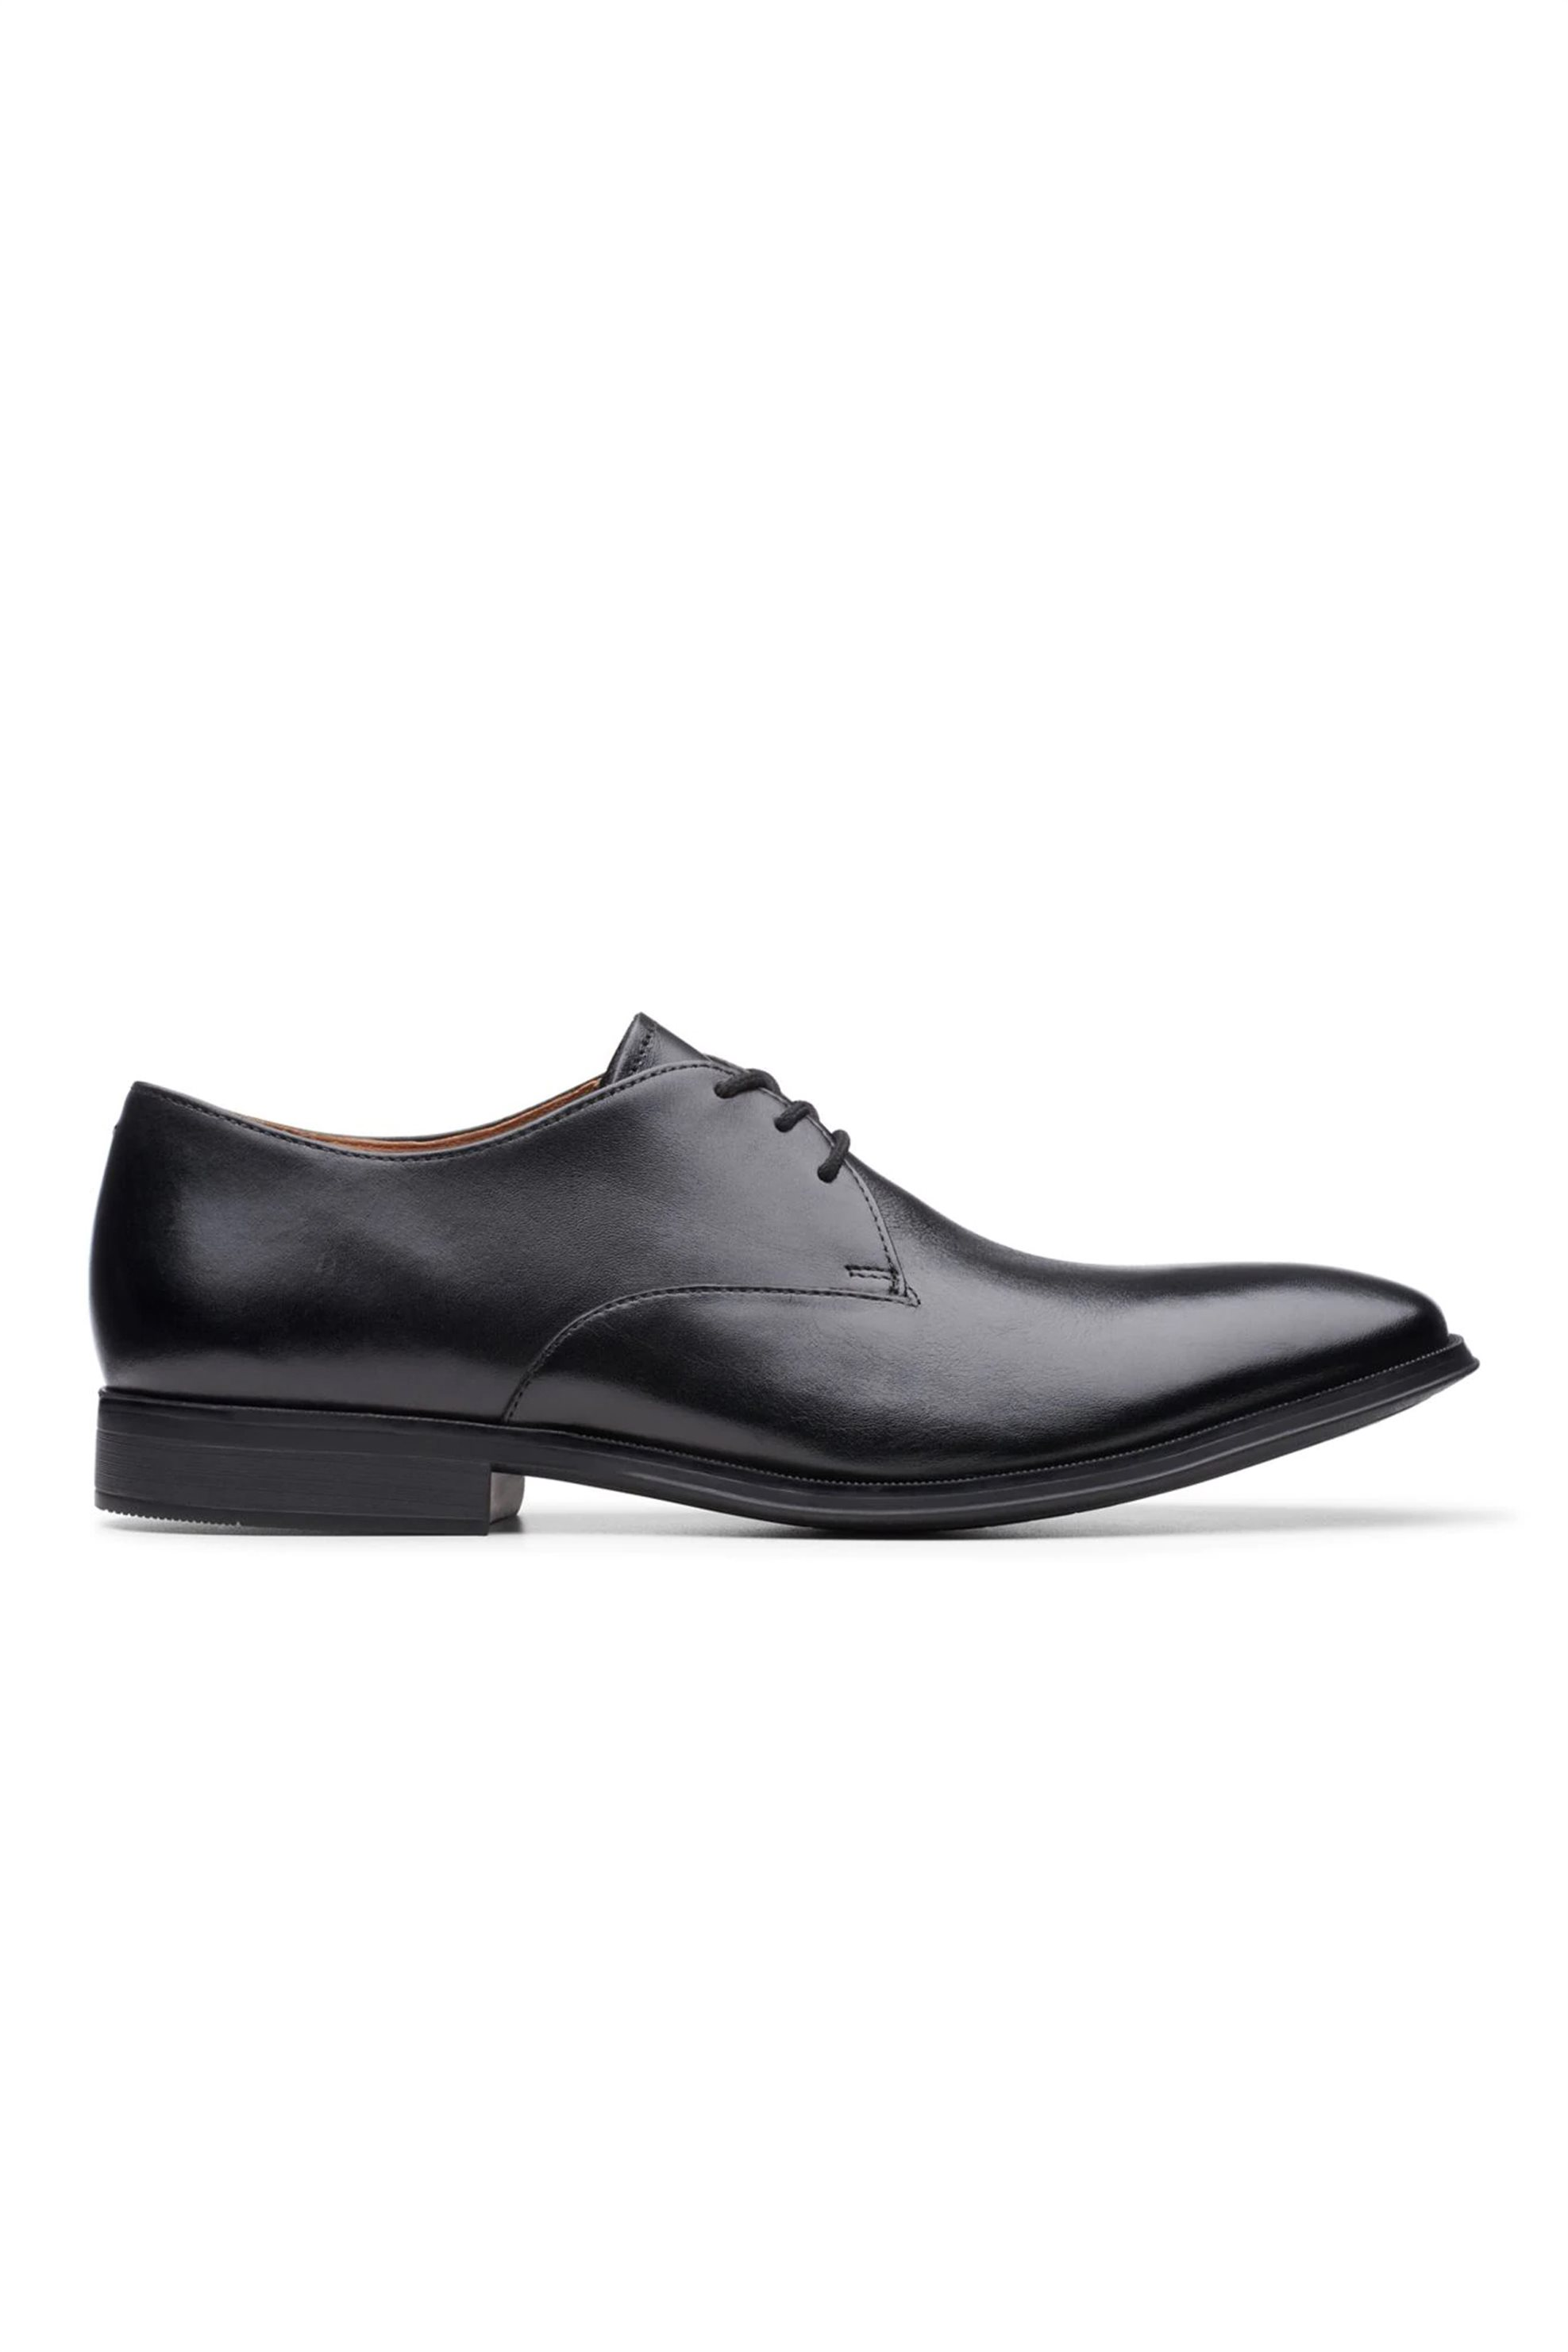 Clarks ανδρικά δερμάτινα παπούτσια oxford «Gilman Walk» – 26144056 – Μαύρο